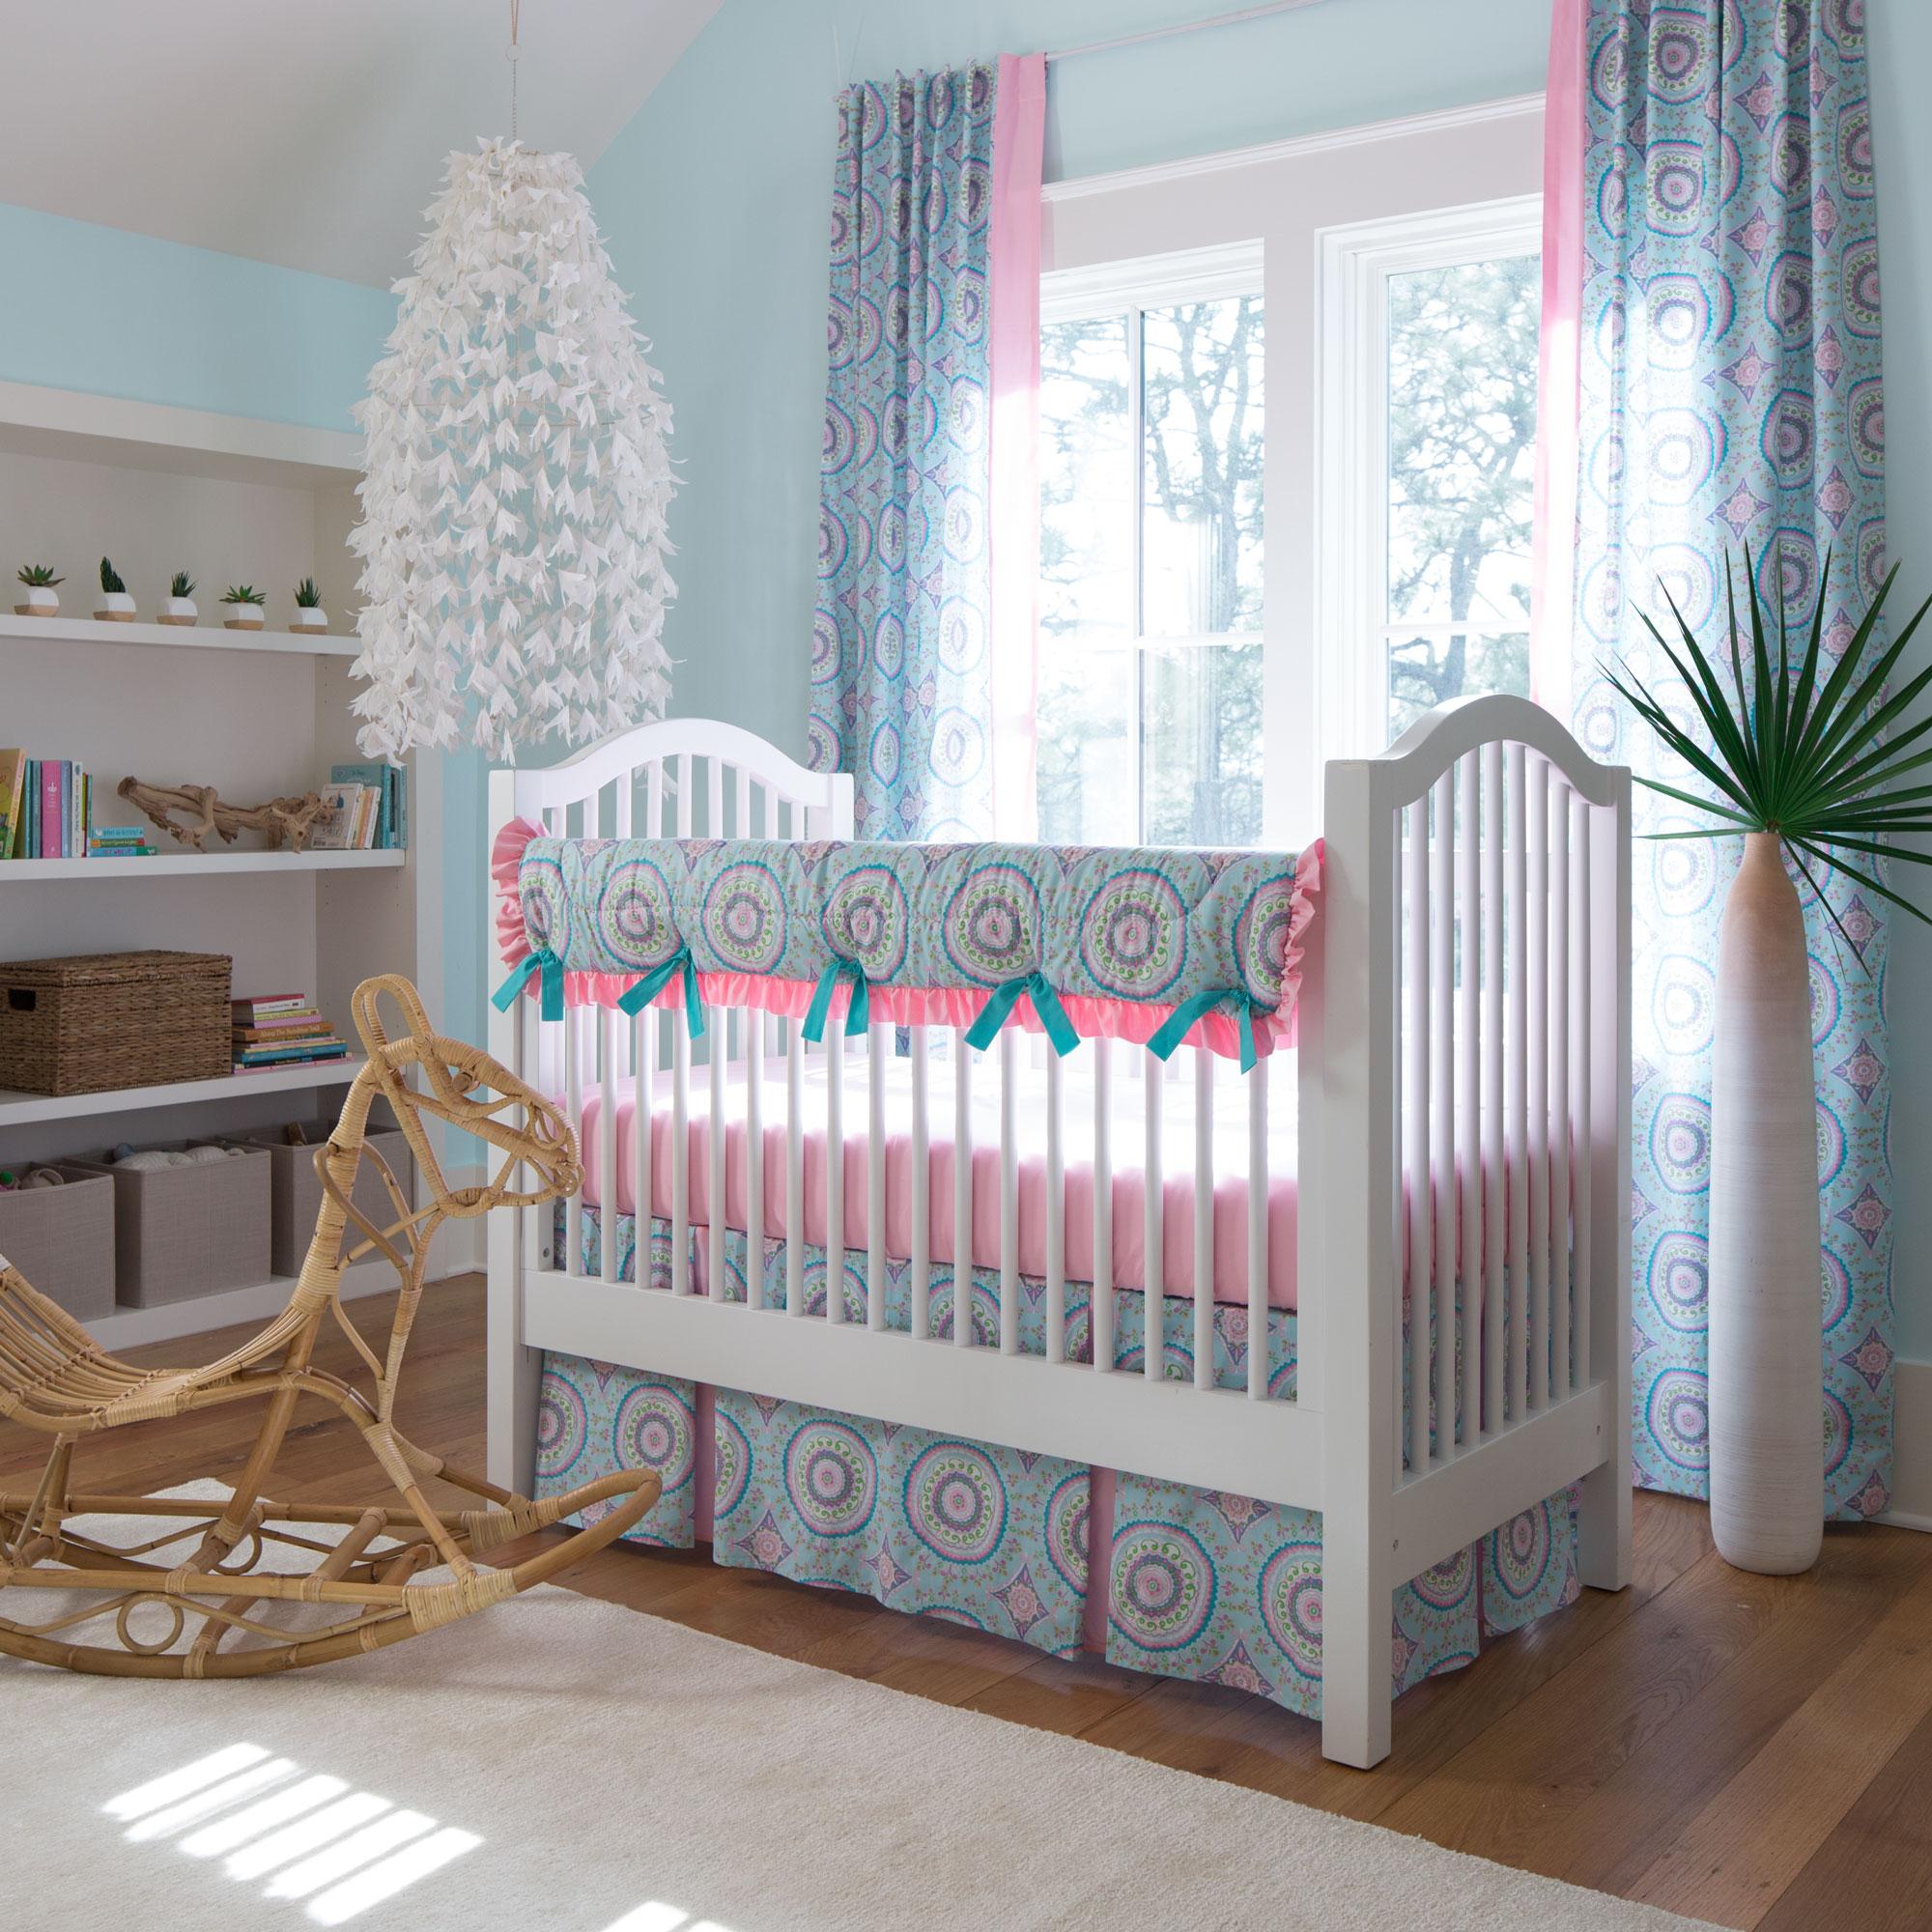 Aqua Haute Crib Bedding Collection from Carousel Designs